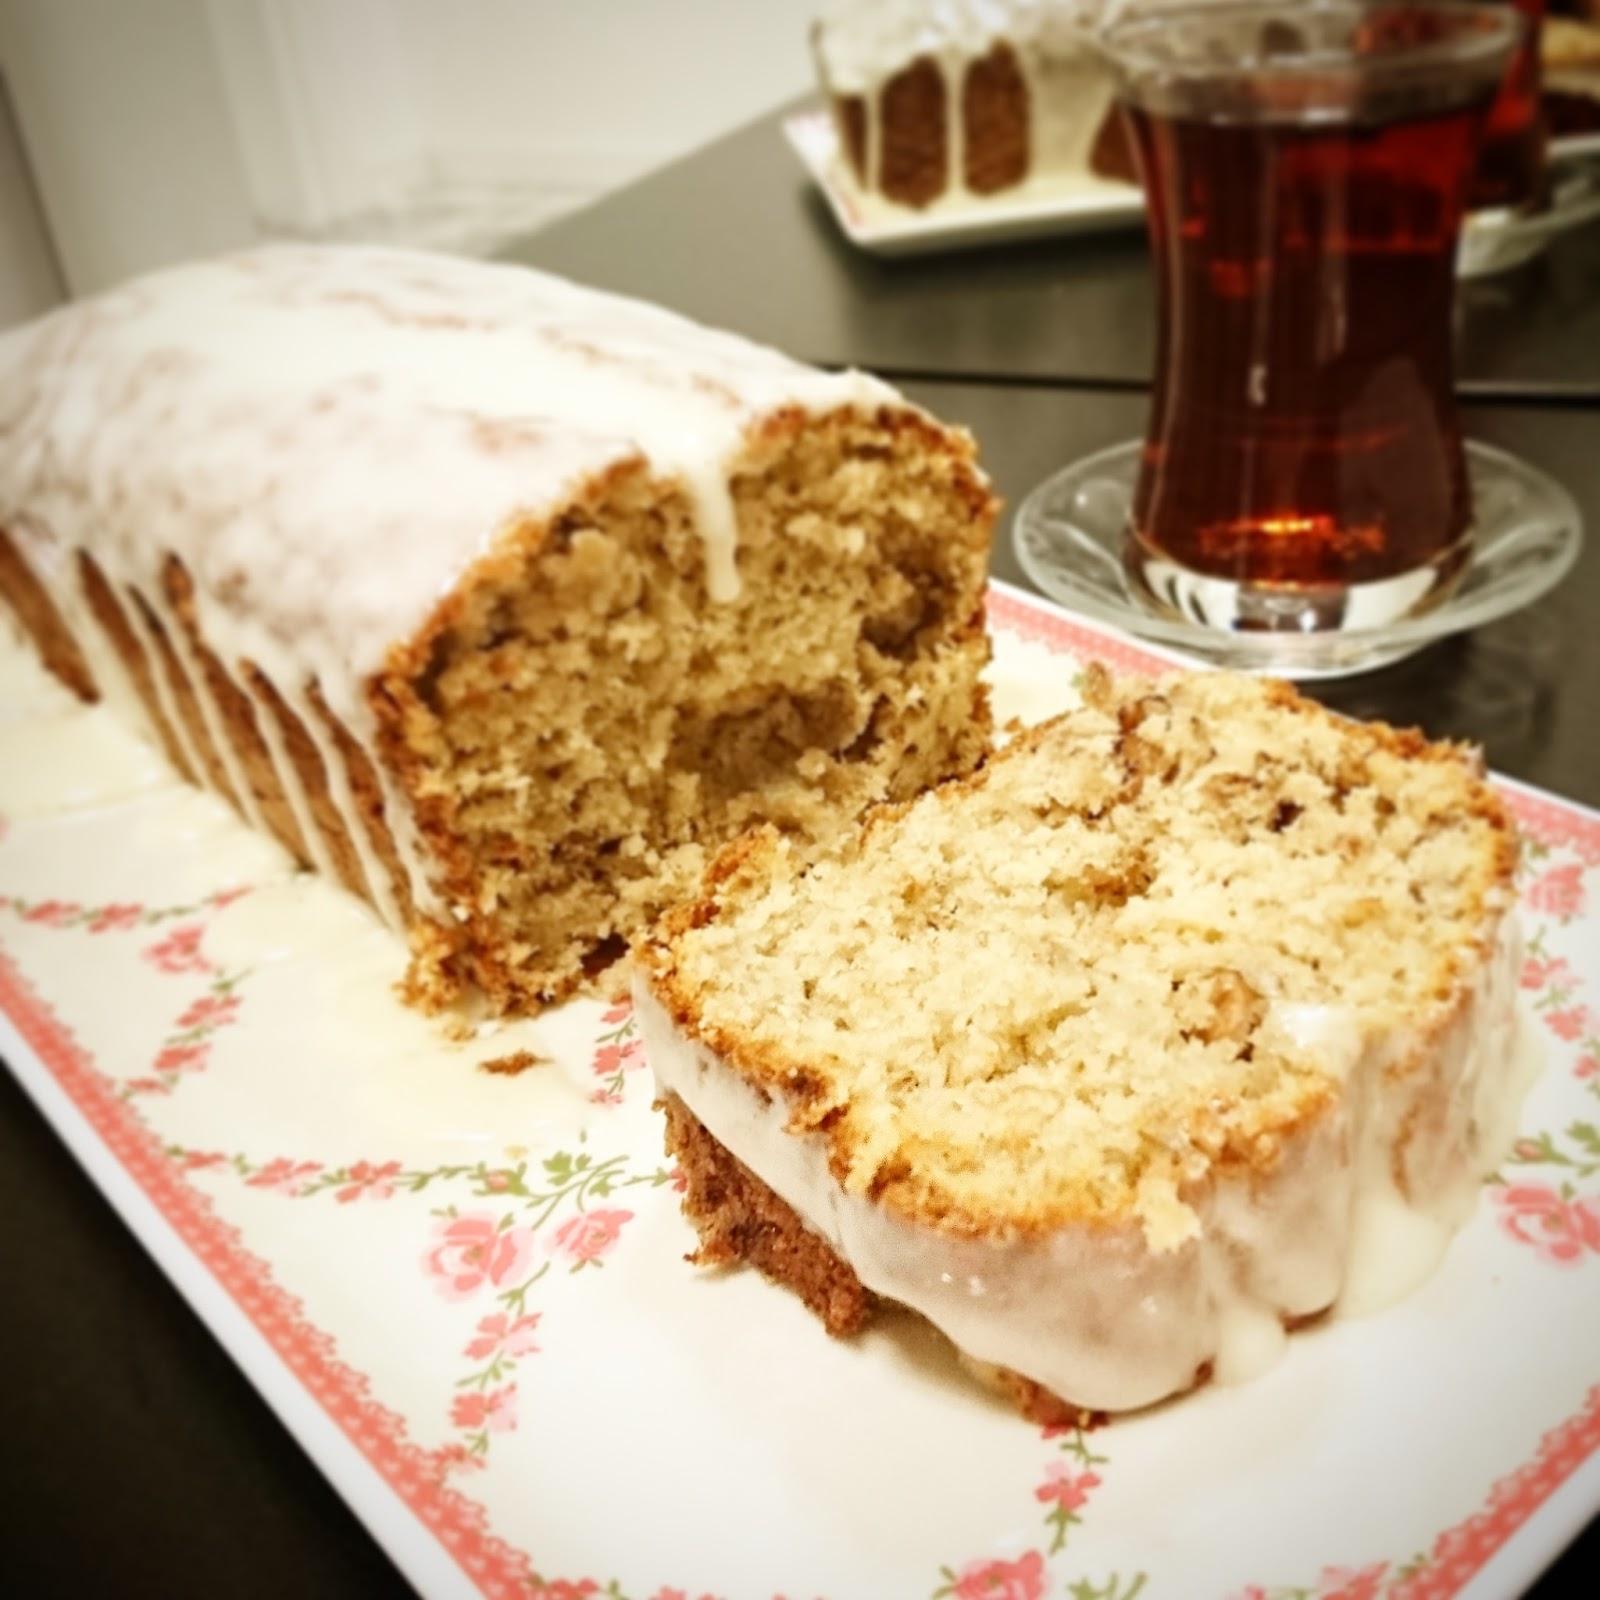 Muzlu cevizli kek tarifi